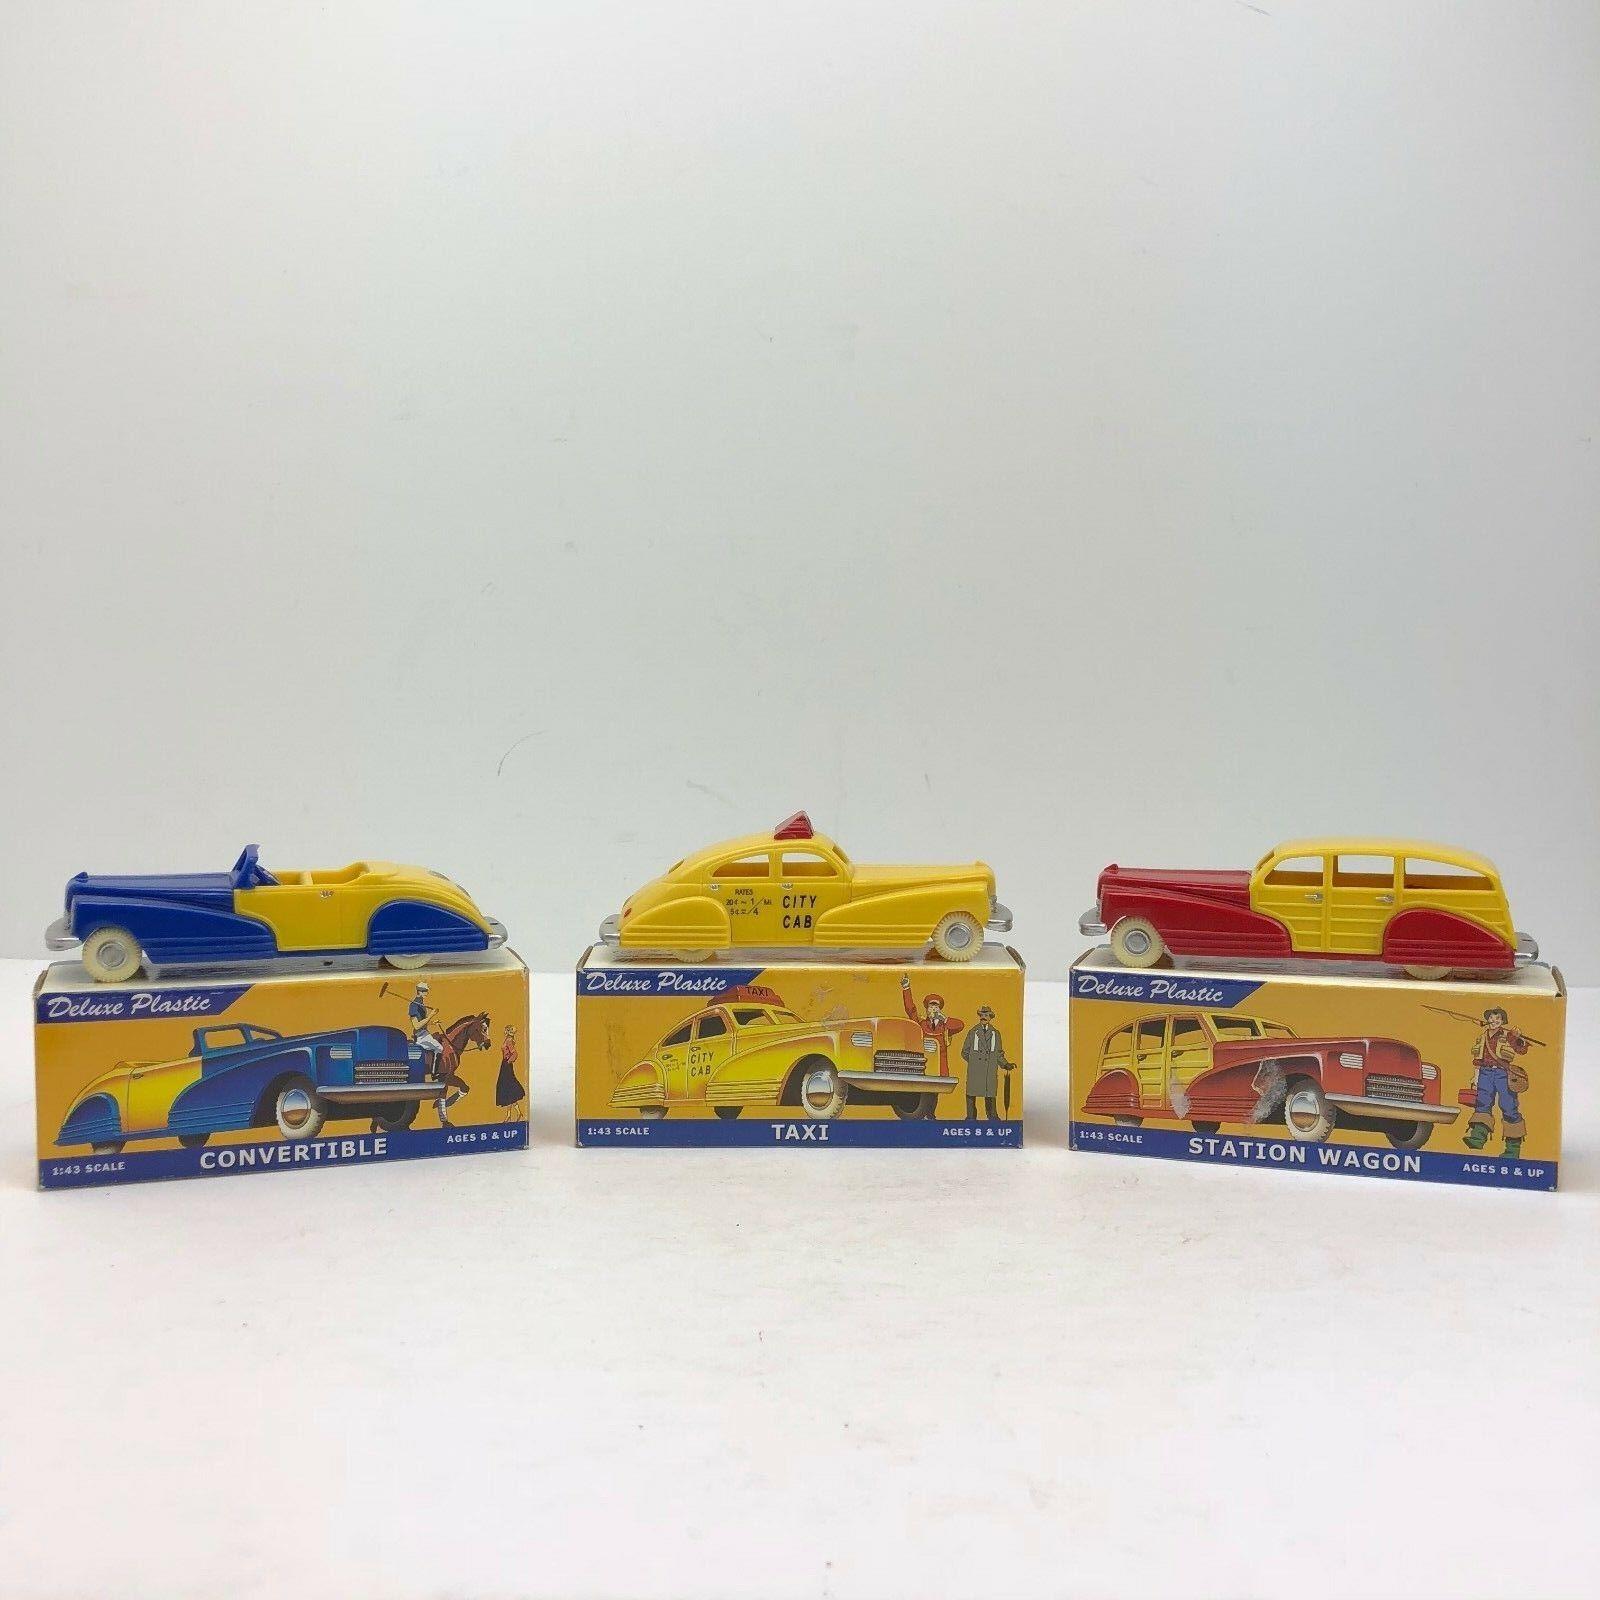 Lot of 3 Binary Binary Binary Arts Deluxe Plastic Cars Congreenible, Taxi, Station Wagon - NIB 0d1343